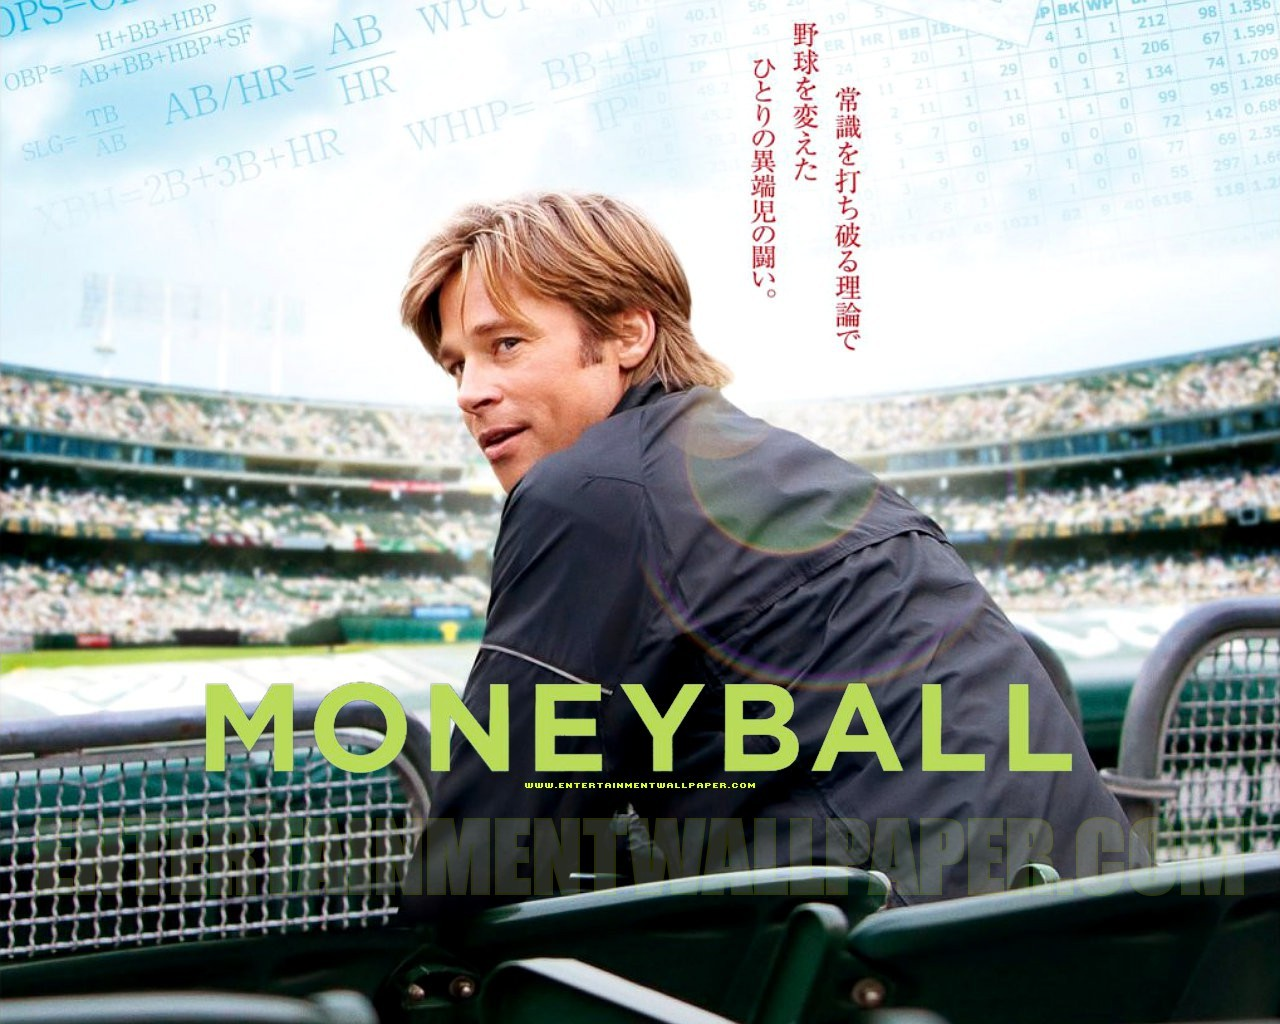 moneyball08